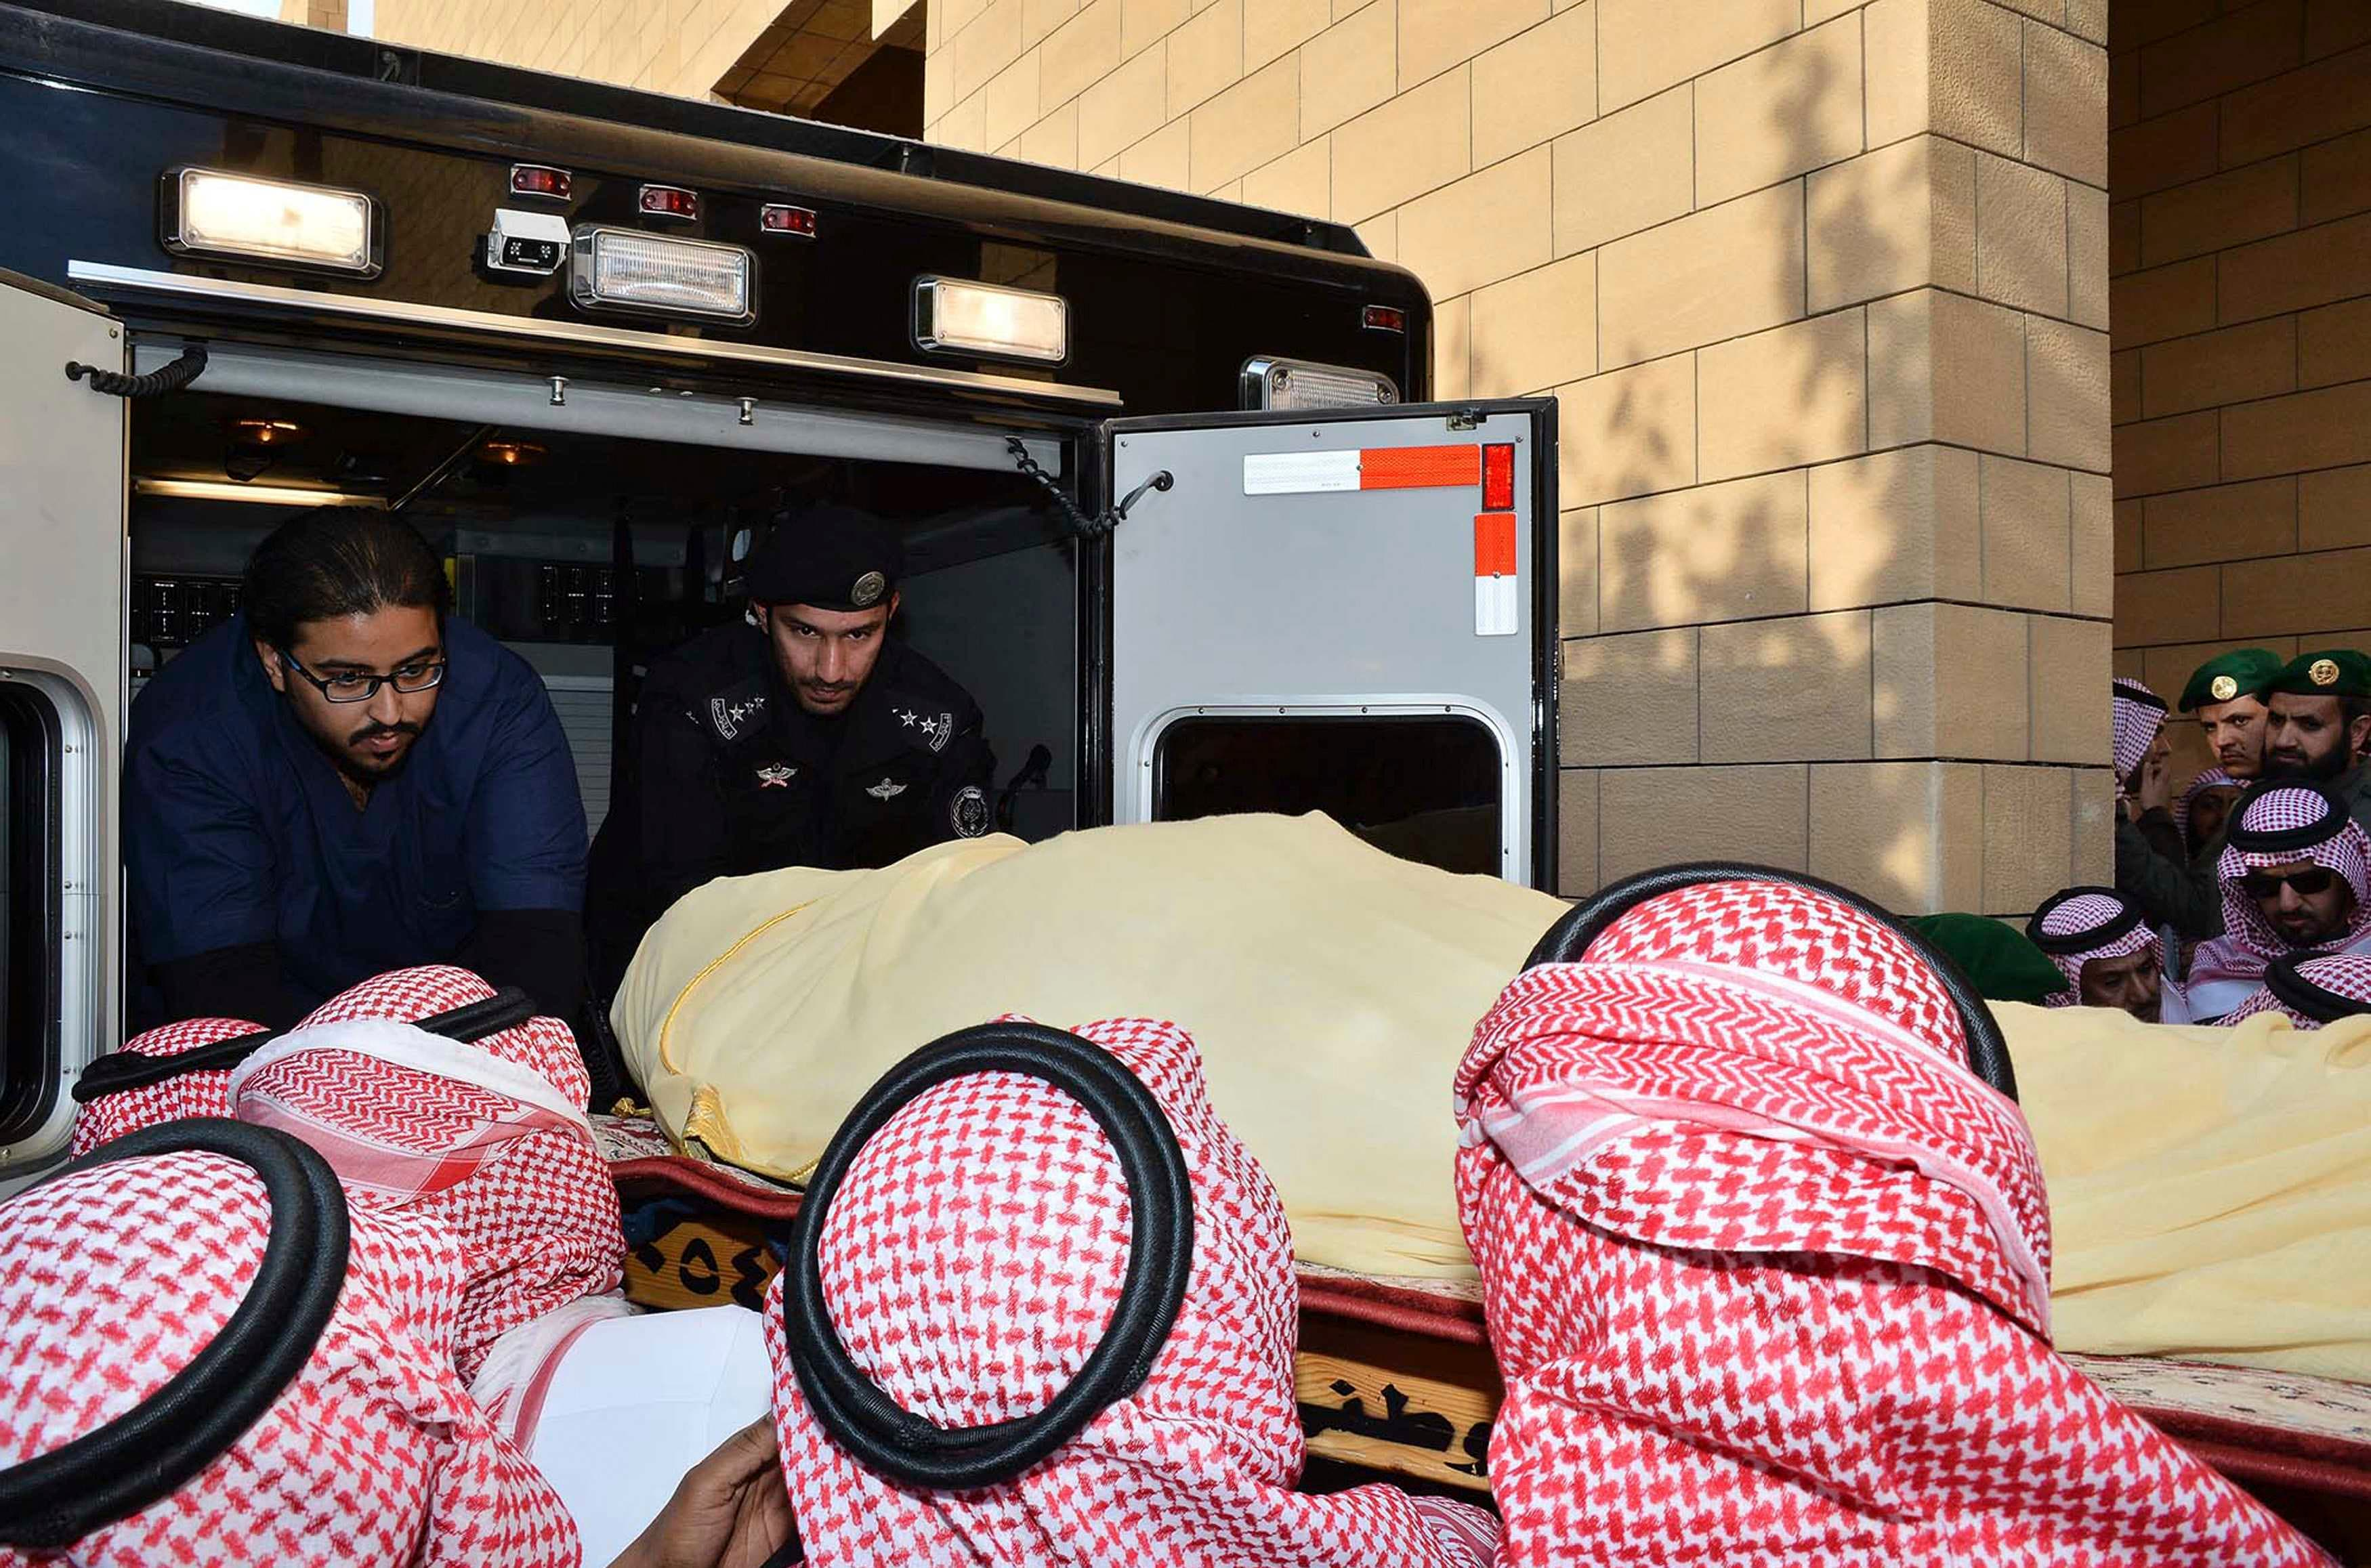 The body of Saudi King Abdullah is carried during his funeral at Imam Turki Bin Abdullah Grand Mosque in Riyadh Jan. 23, 2015. (Reuters)